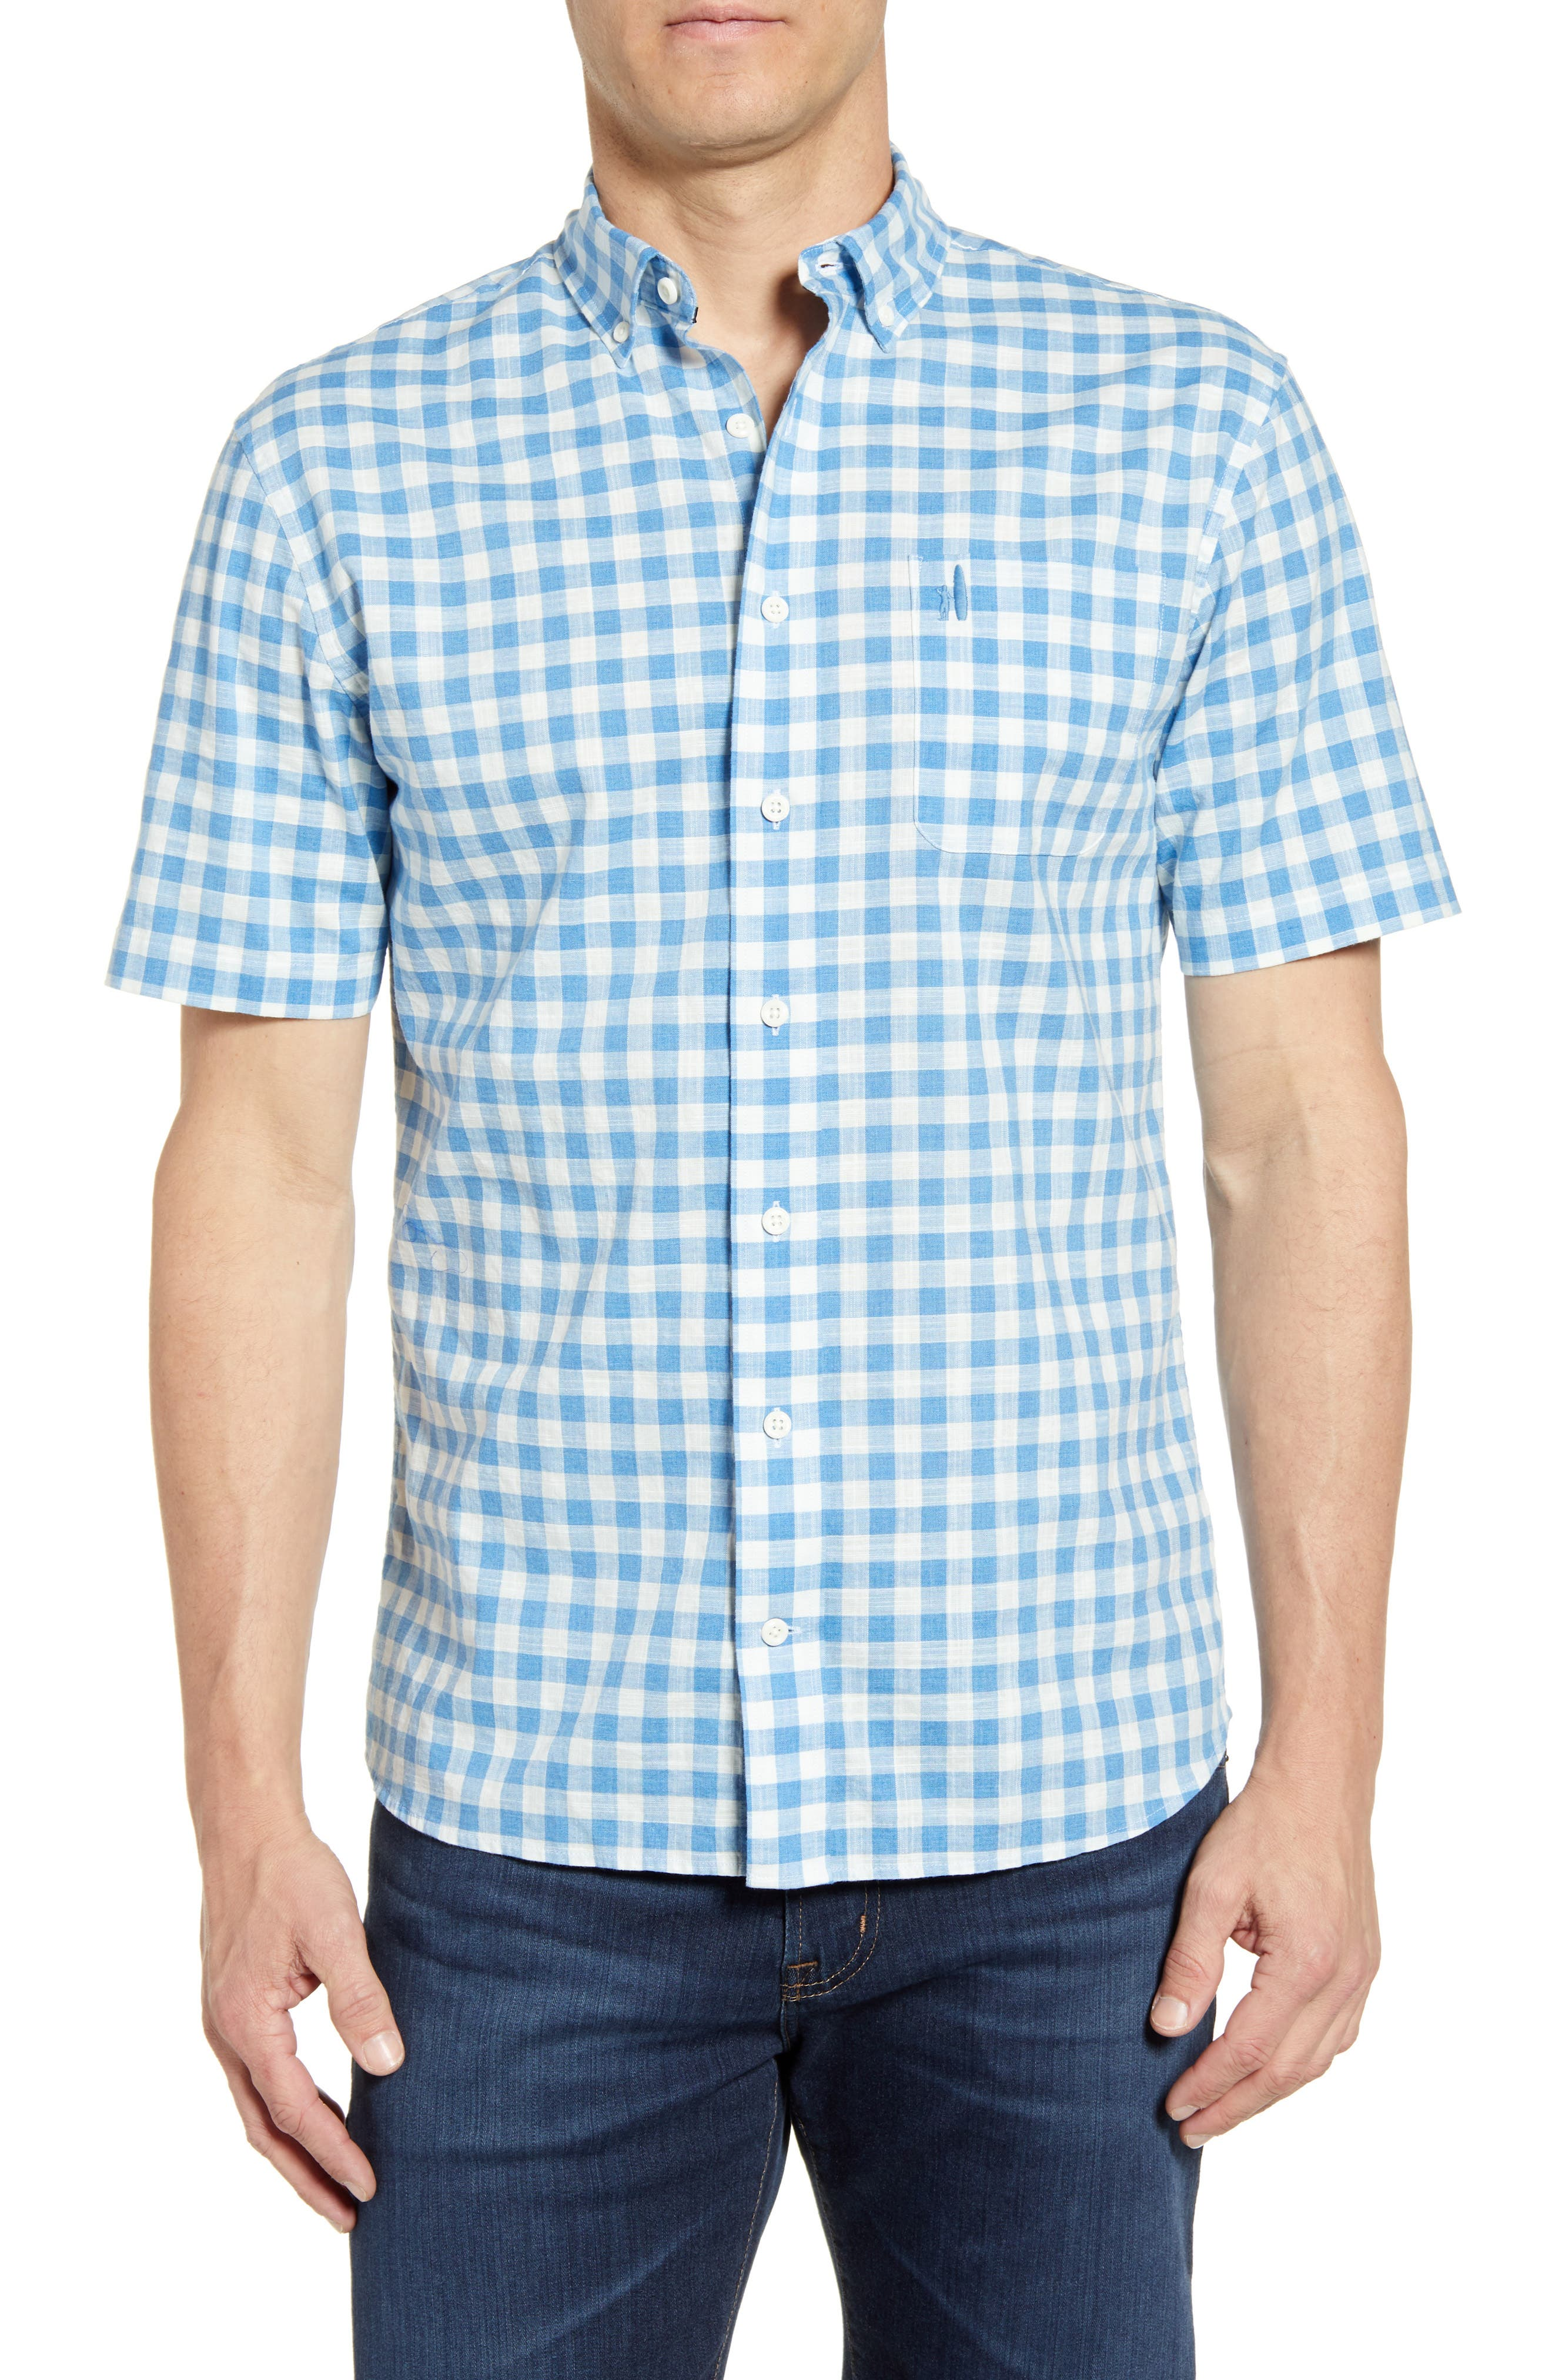 Watts Classic Fit Gingham Shirt